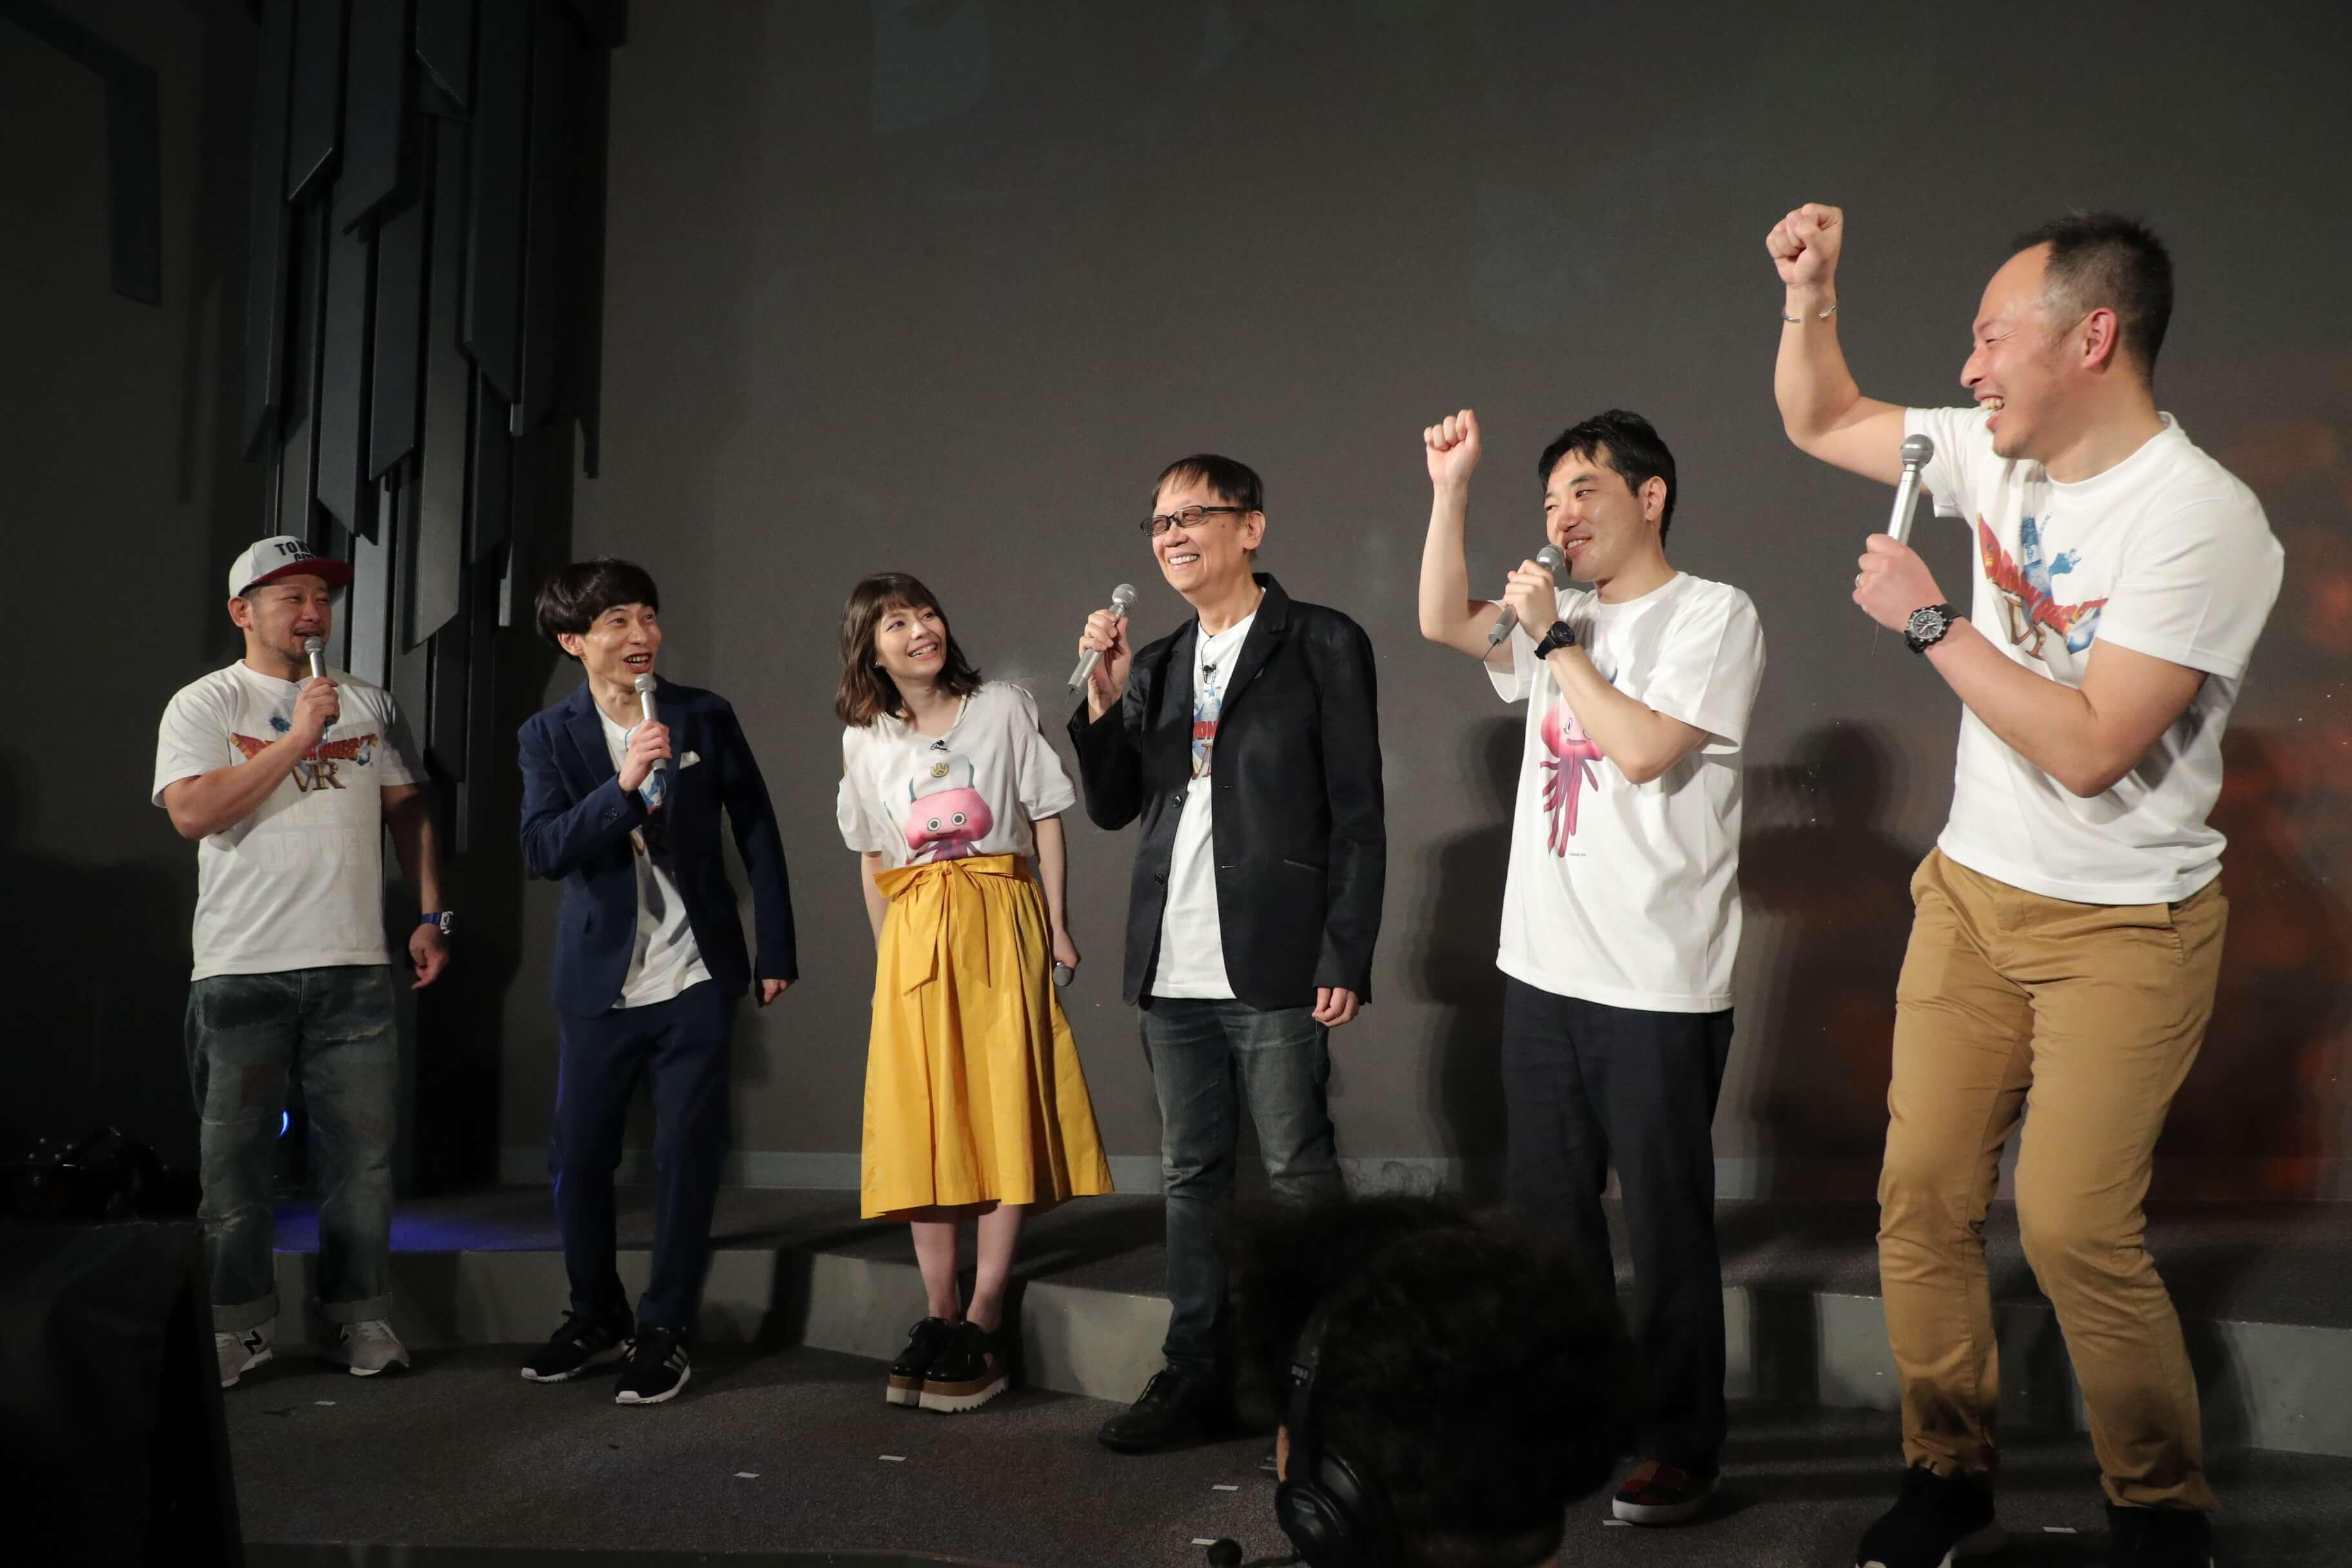 Experience VR Dragon Quest at VR ZONE SHINJUKU